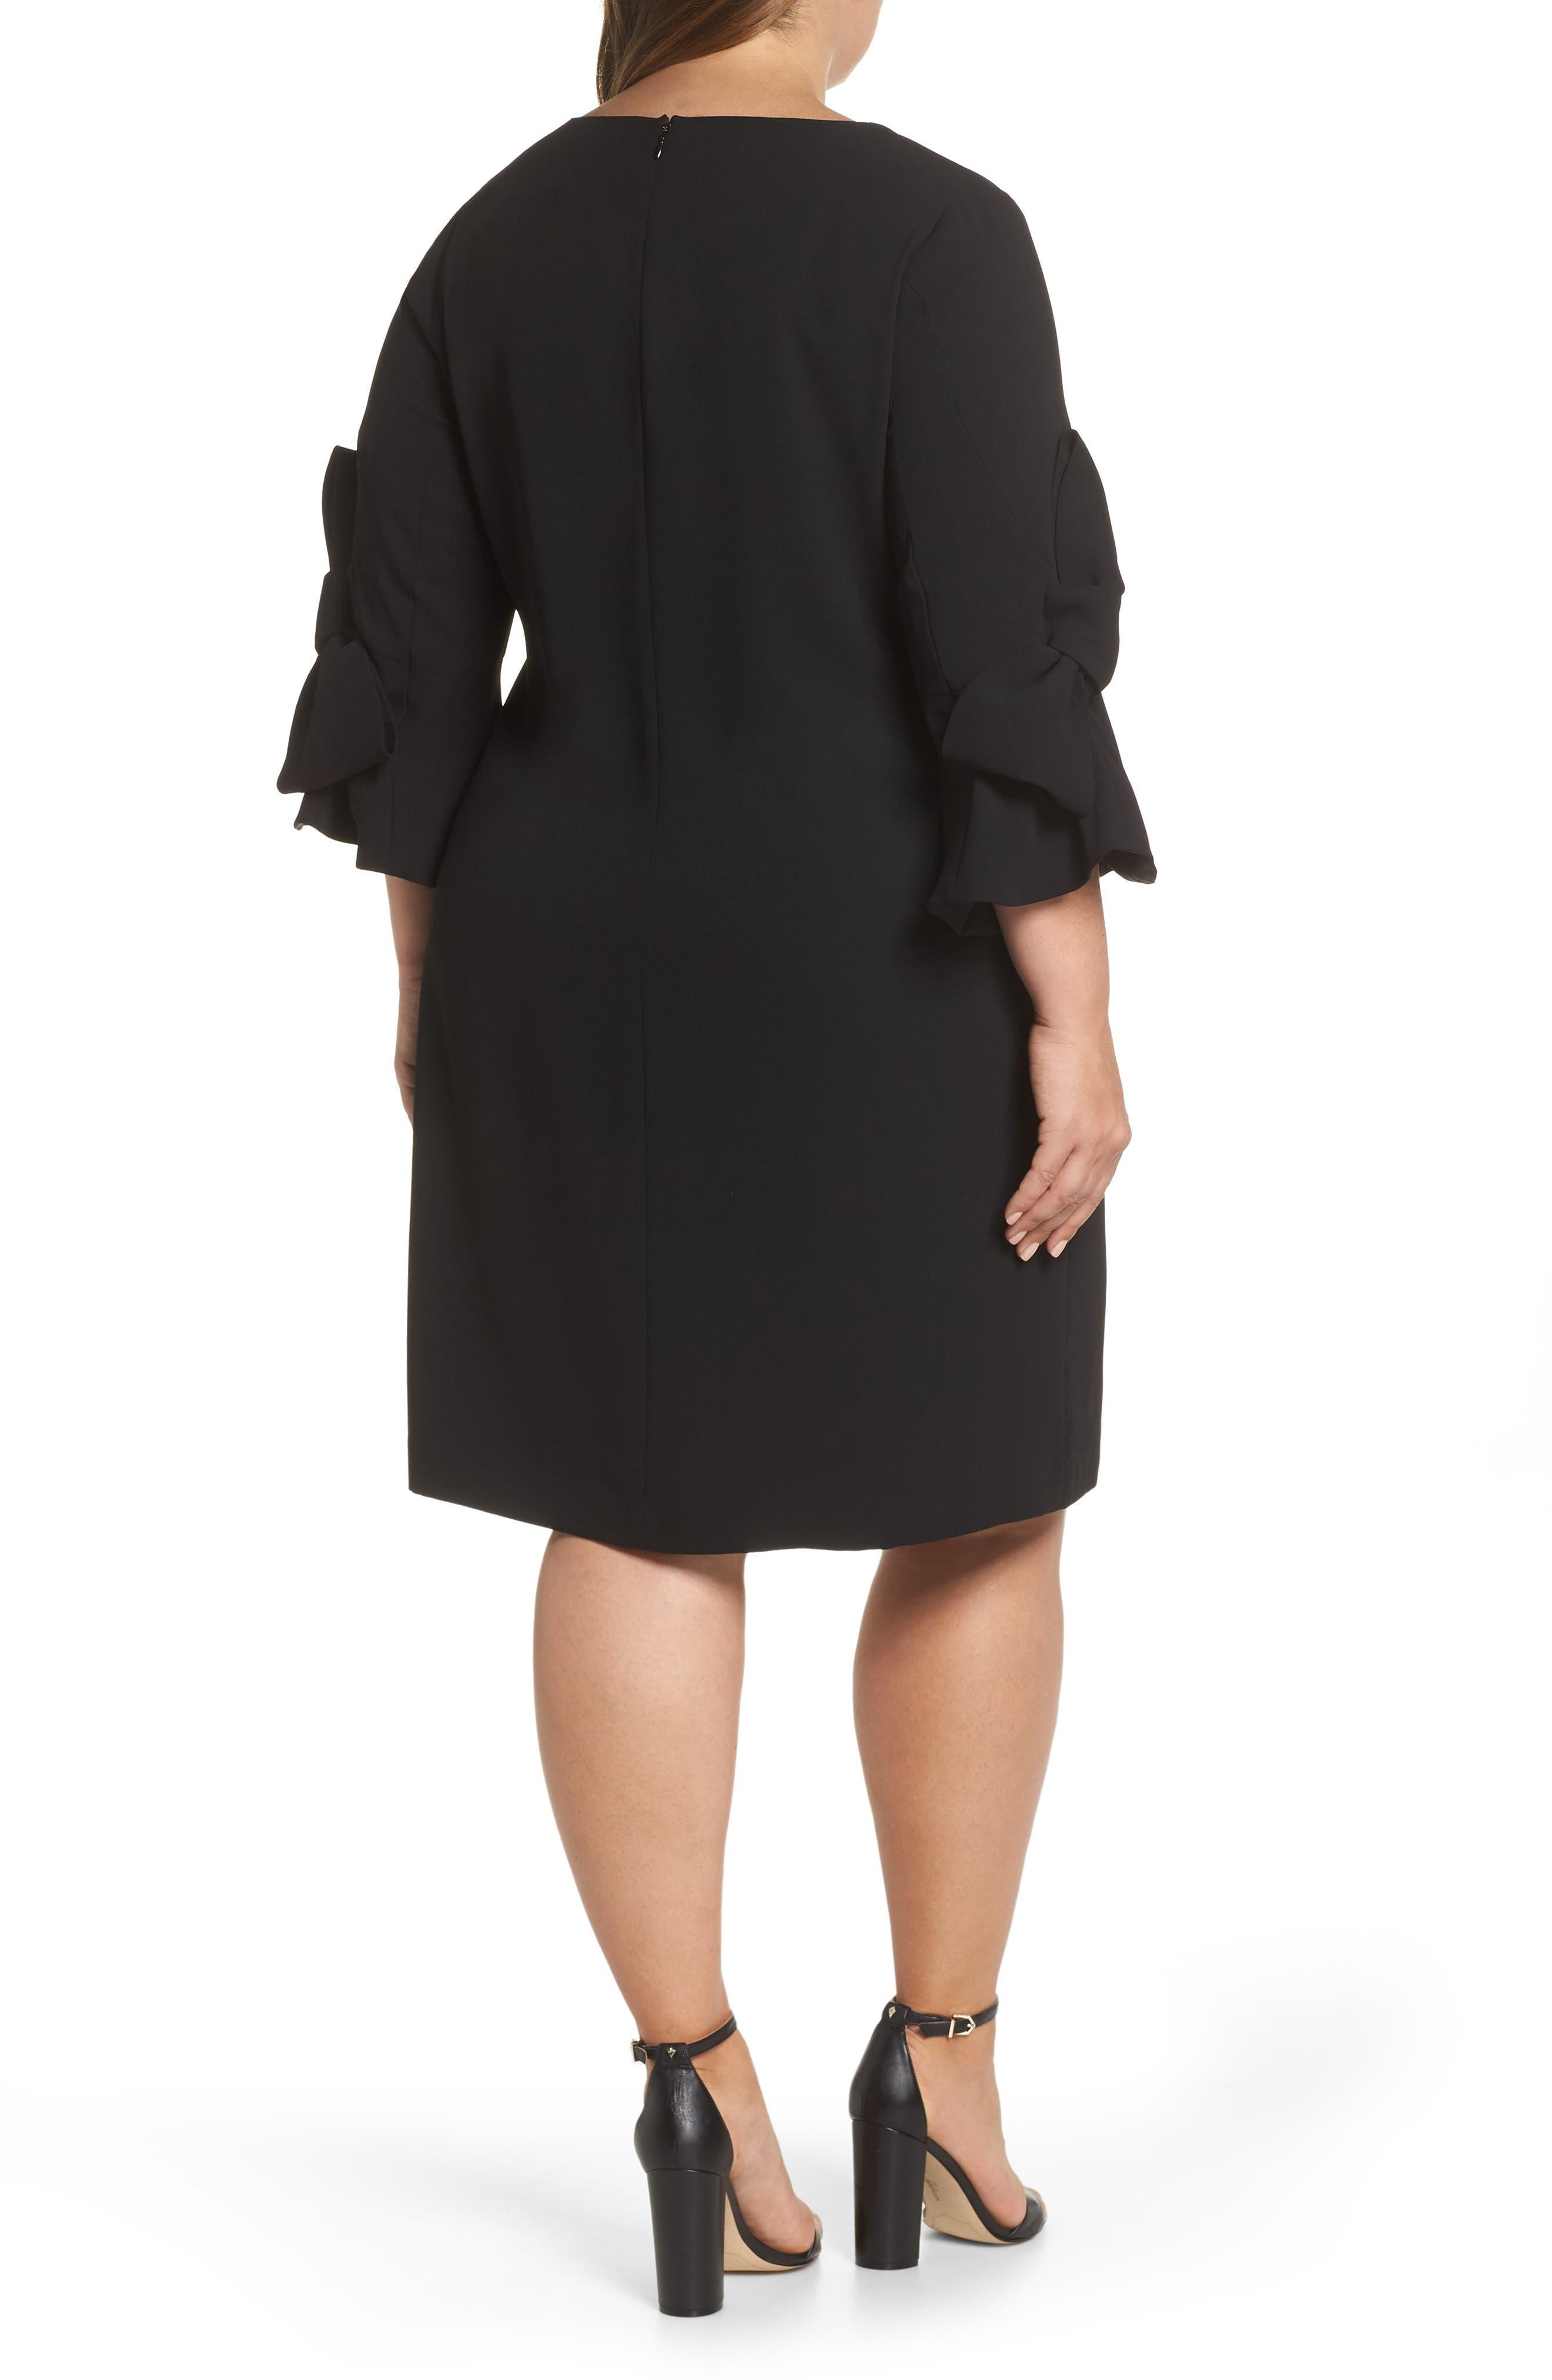 Moss Crepe Bow Shift Dress,                             Alternate thumbnail 2, color,                             RICH BLACK